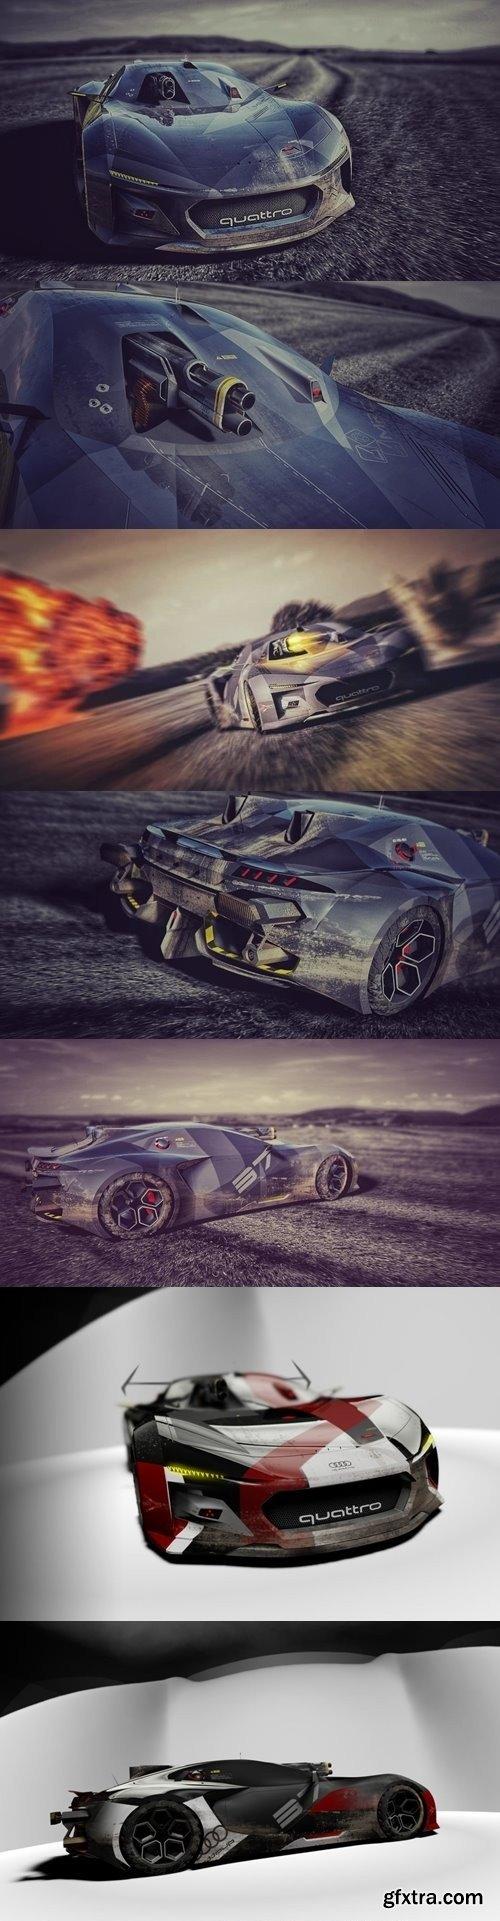 Audi Quattro Spectre BattleDrone Concept Car